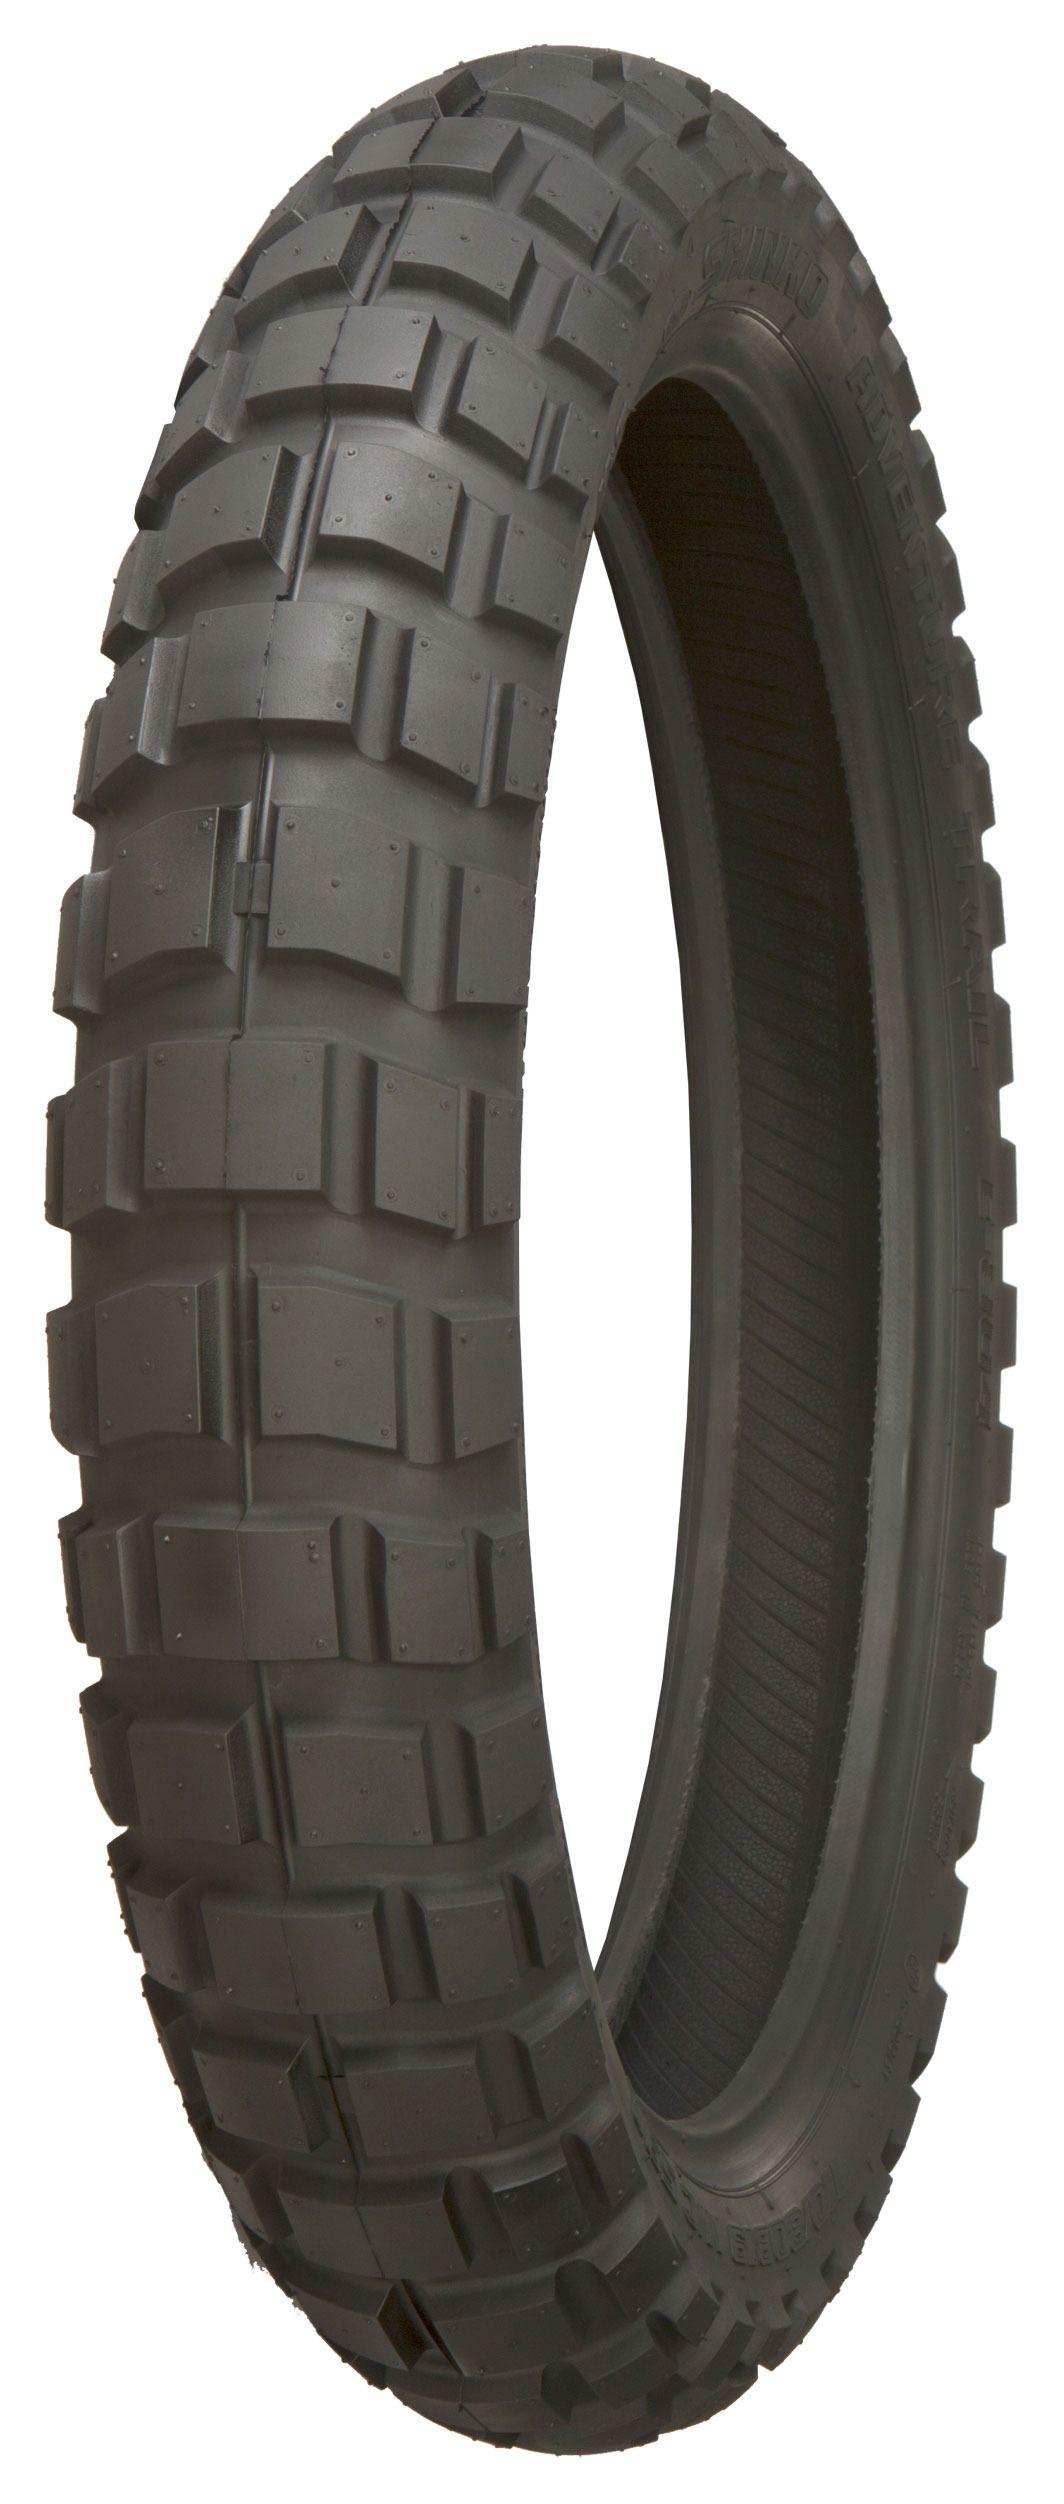 Pirelli Dual Sport Tires >> Mefo Explorer Dual Sport Tires - Cycle Gear